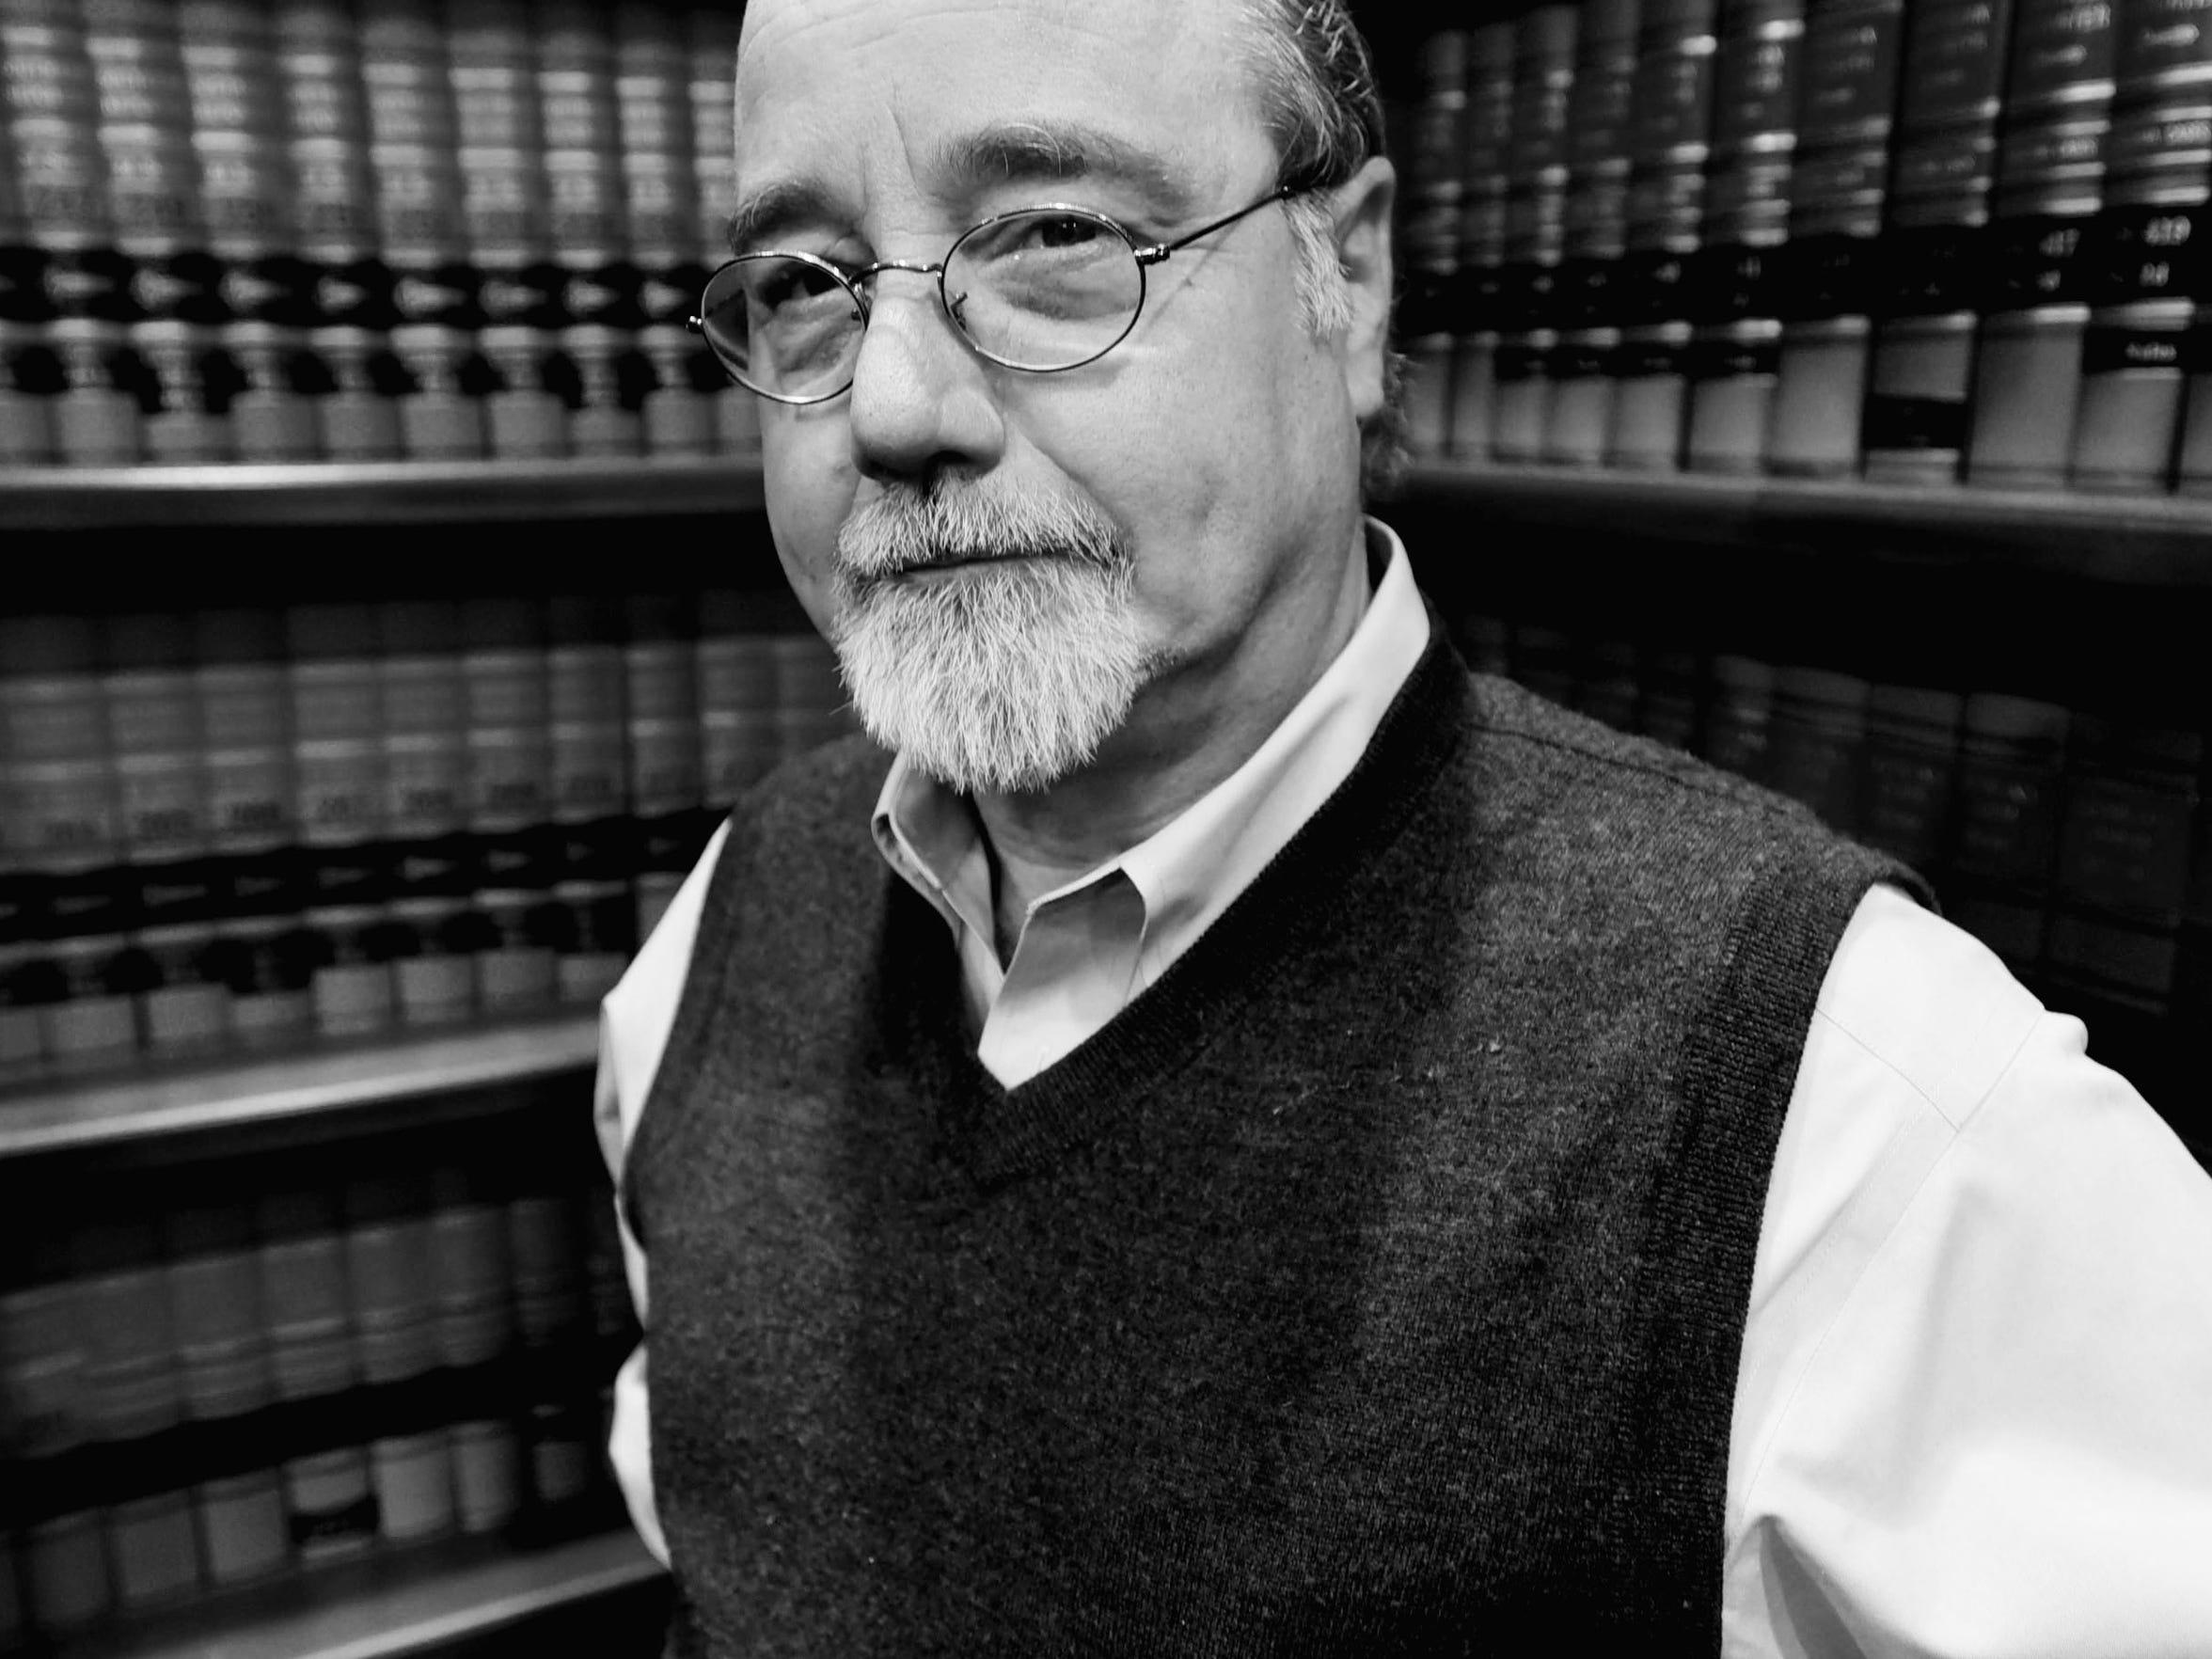 Peter Flowers, a criminal defense attorney in Shreveport,